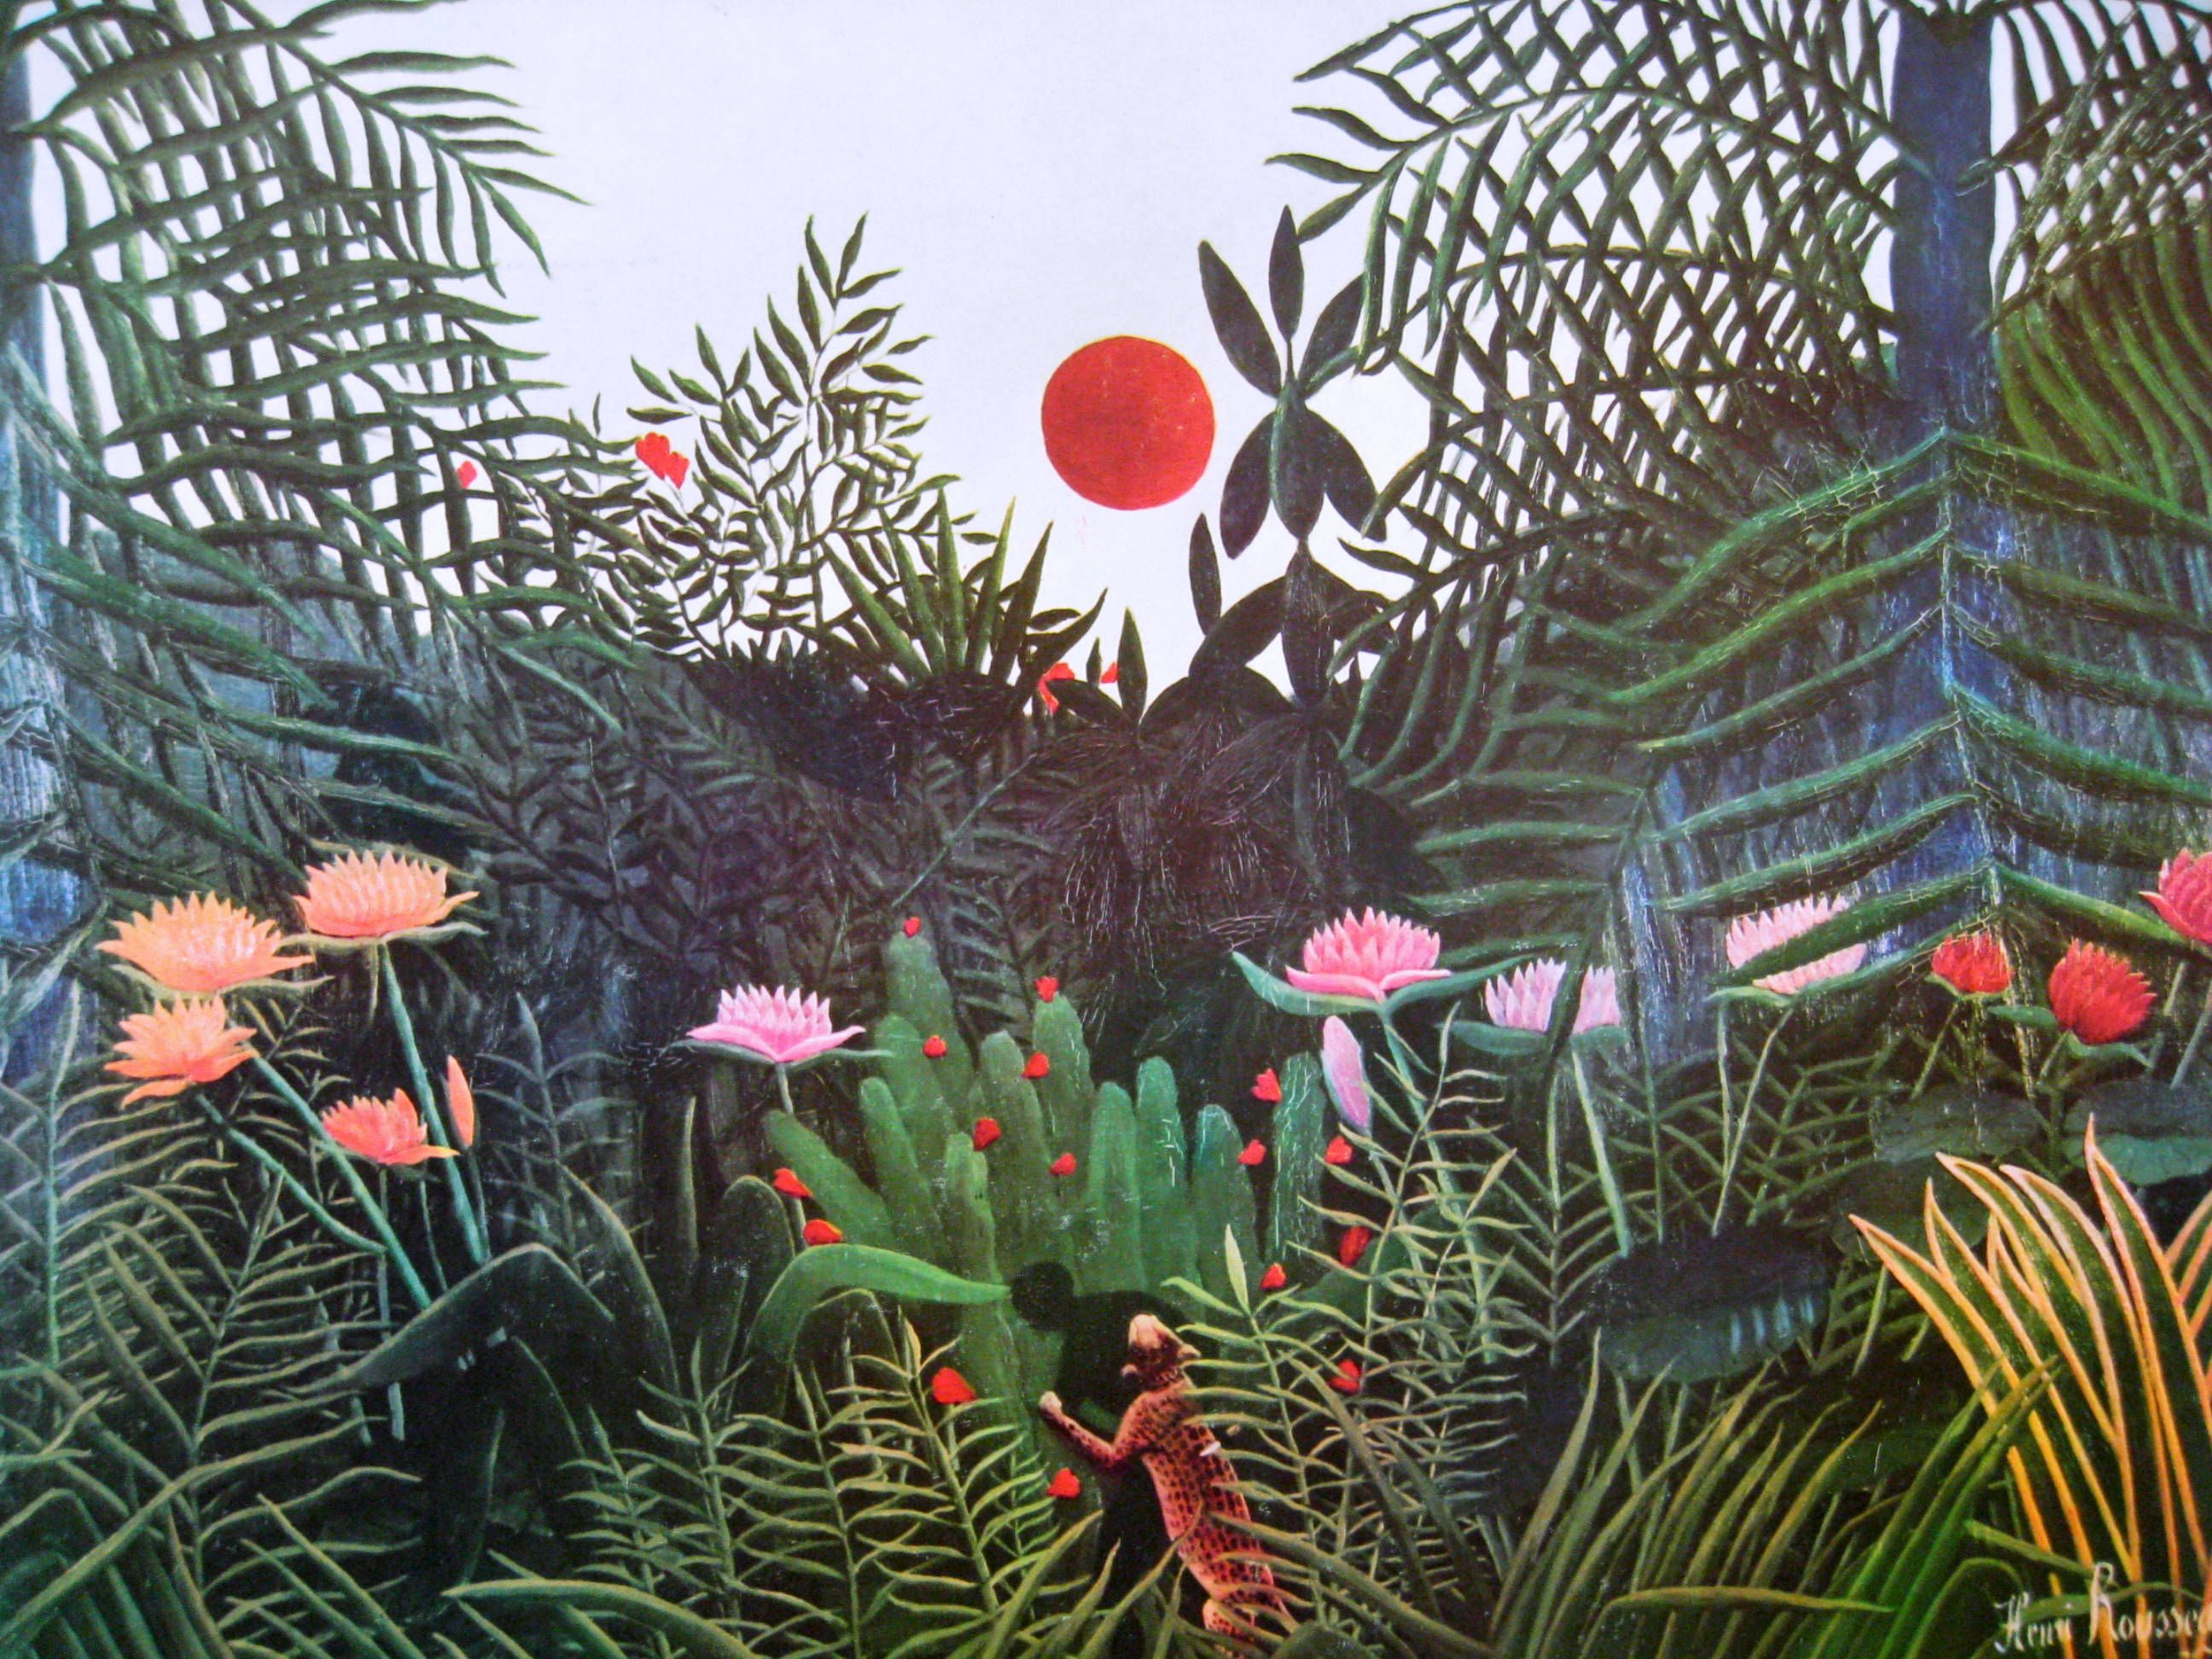 Henri Rousseau | Nature / photoshop | Pinterest | Henri rousseau ...